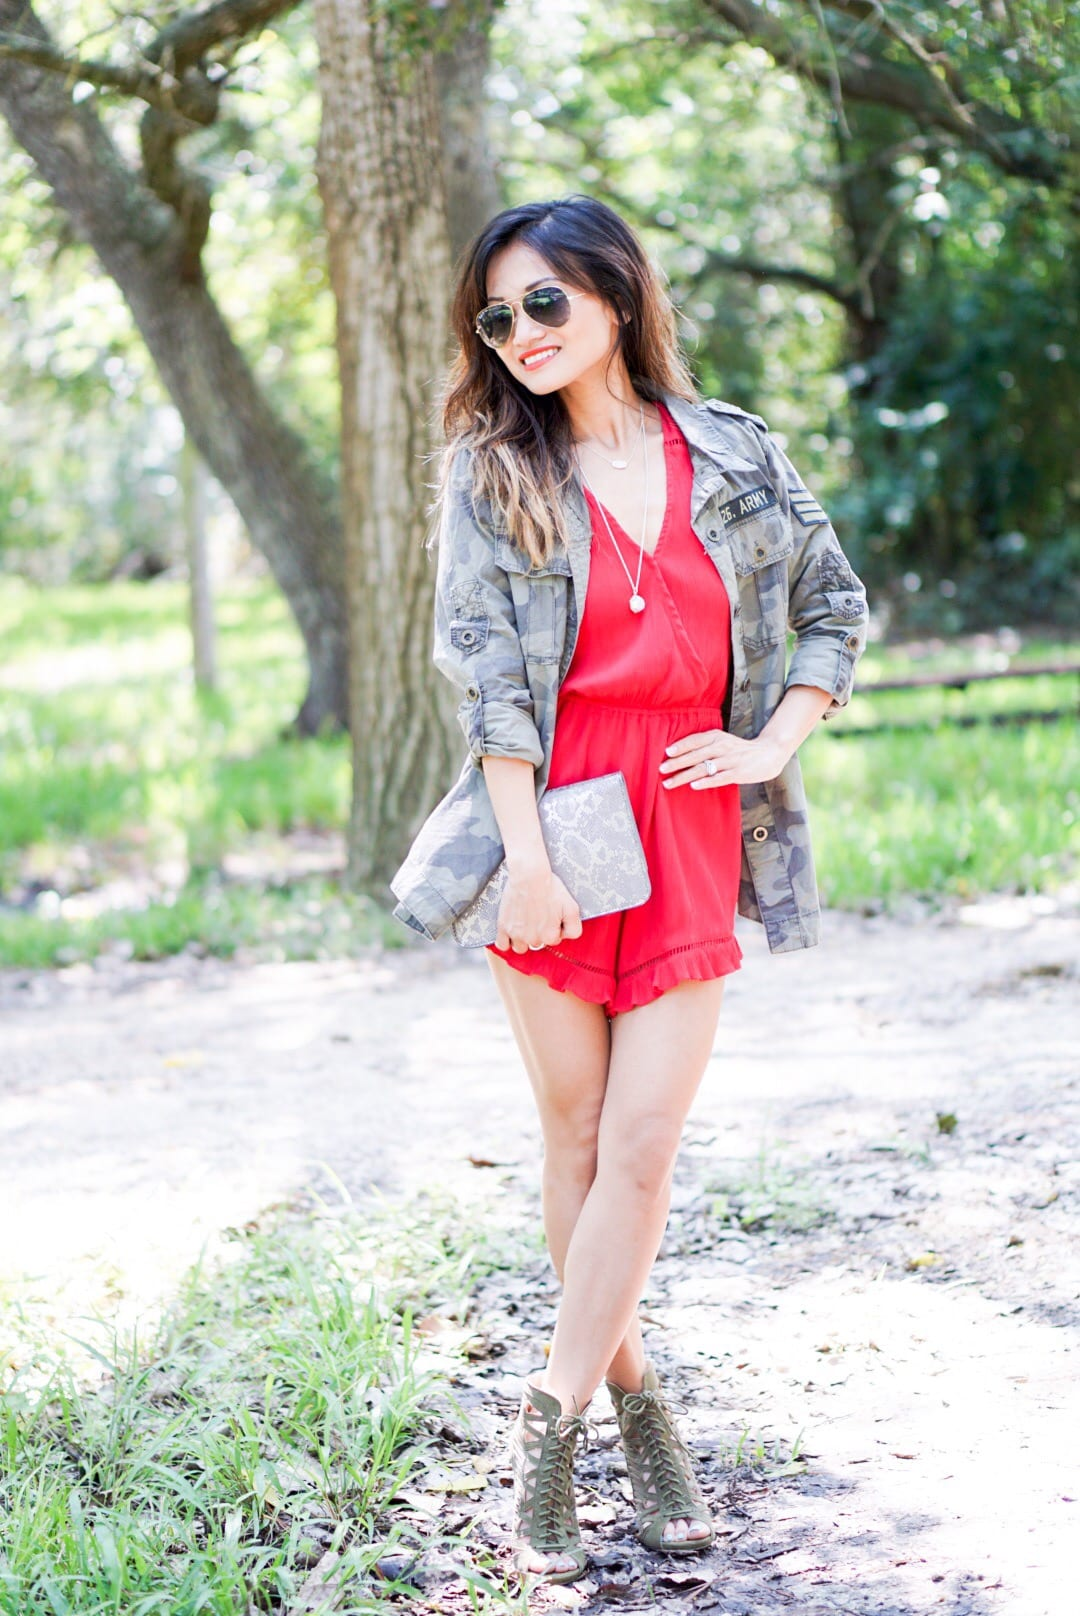 How to Dress Up The Camo Jacket